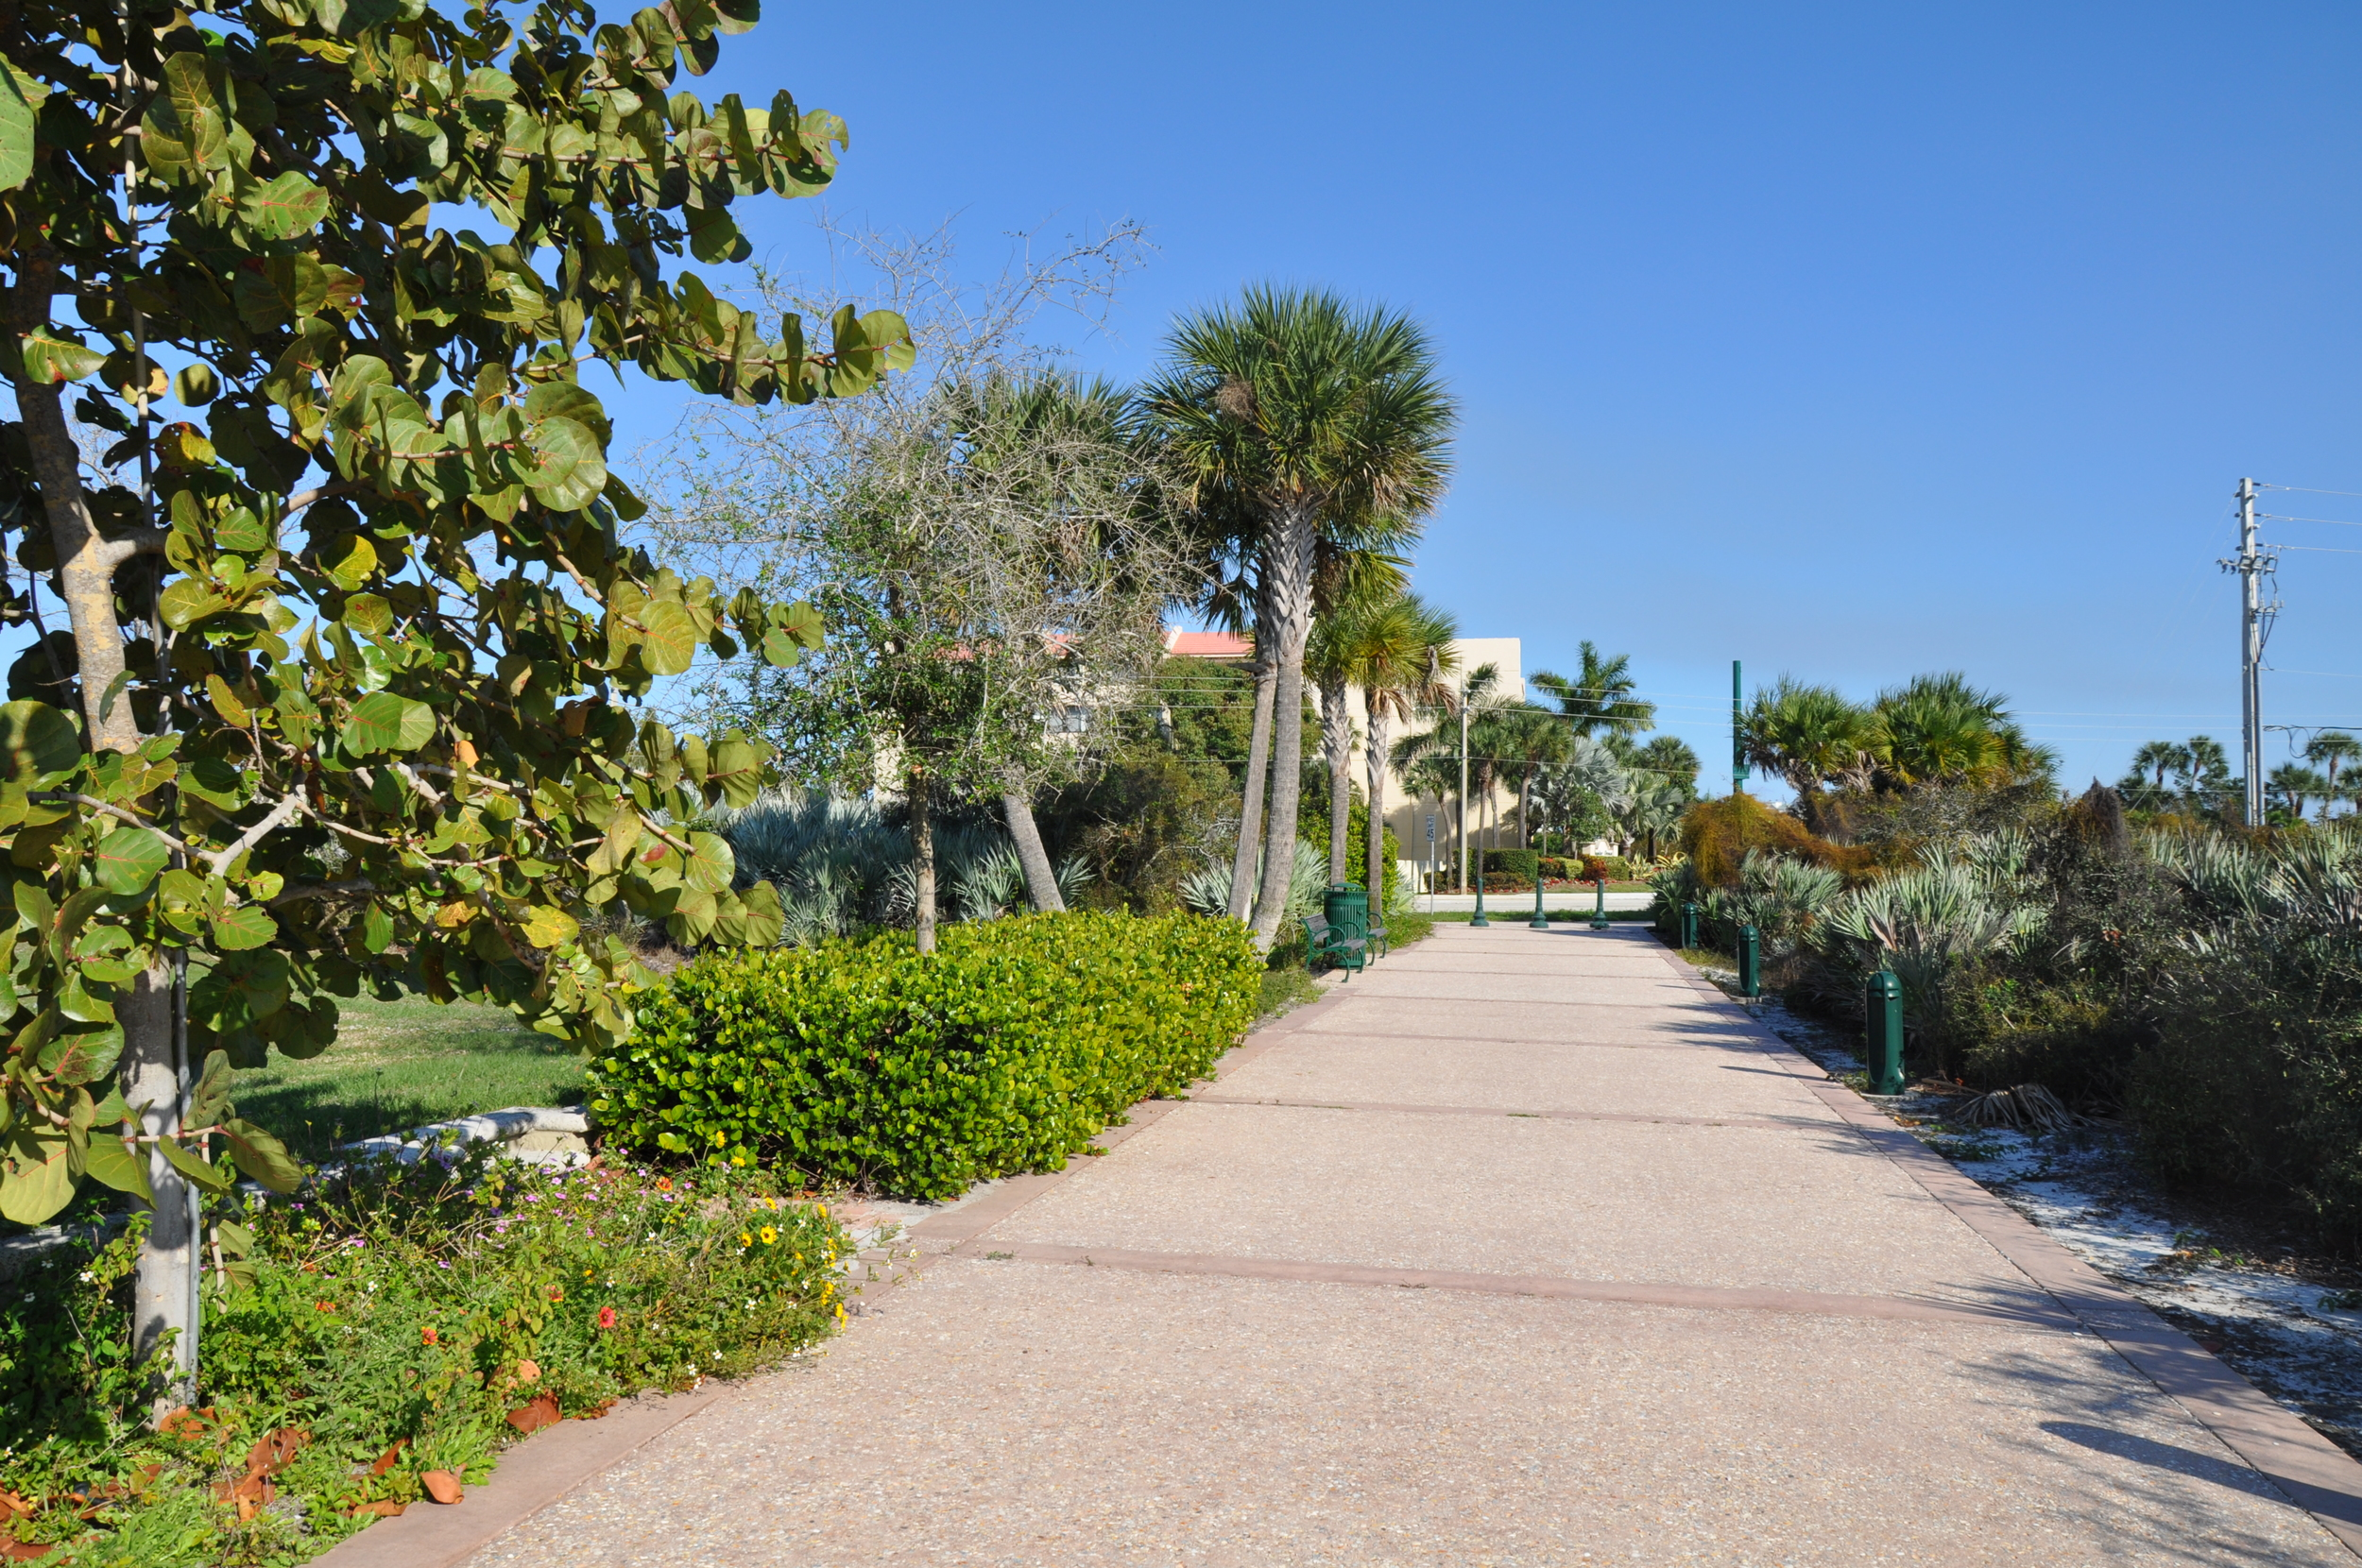 Tierra Del Sol Jupiter Florida Riverwalk Colored Tabby Concrete.JPG